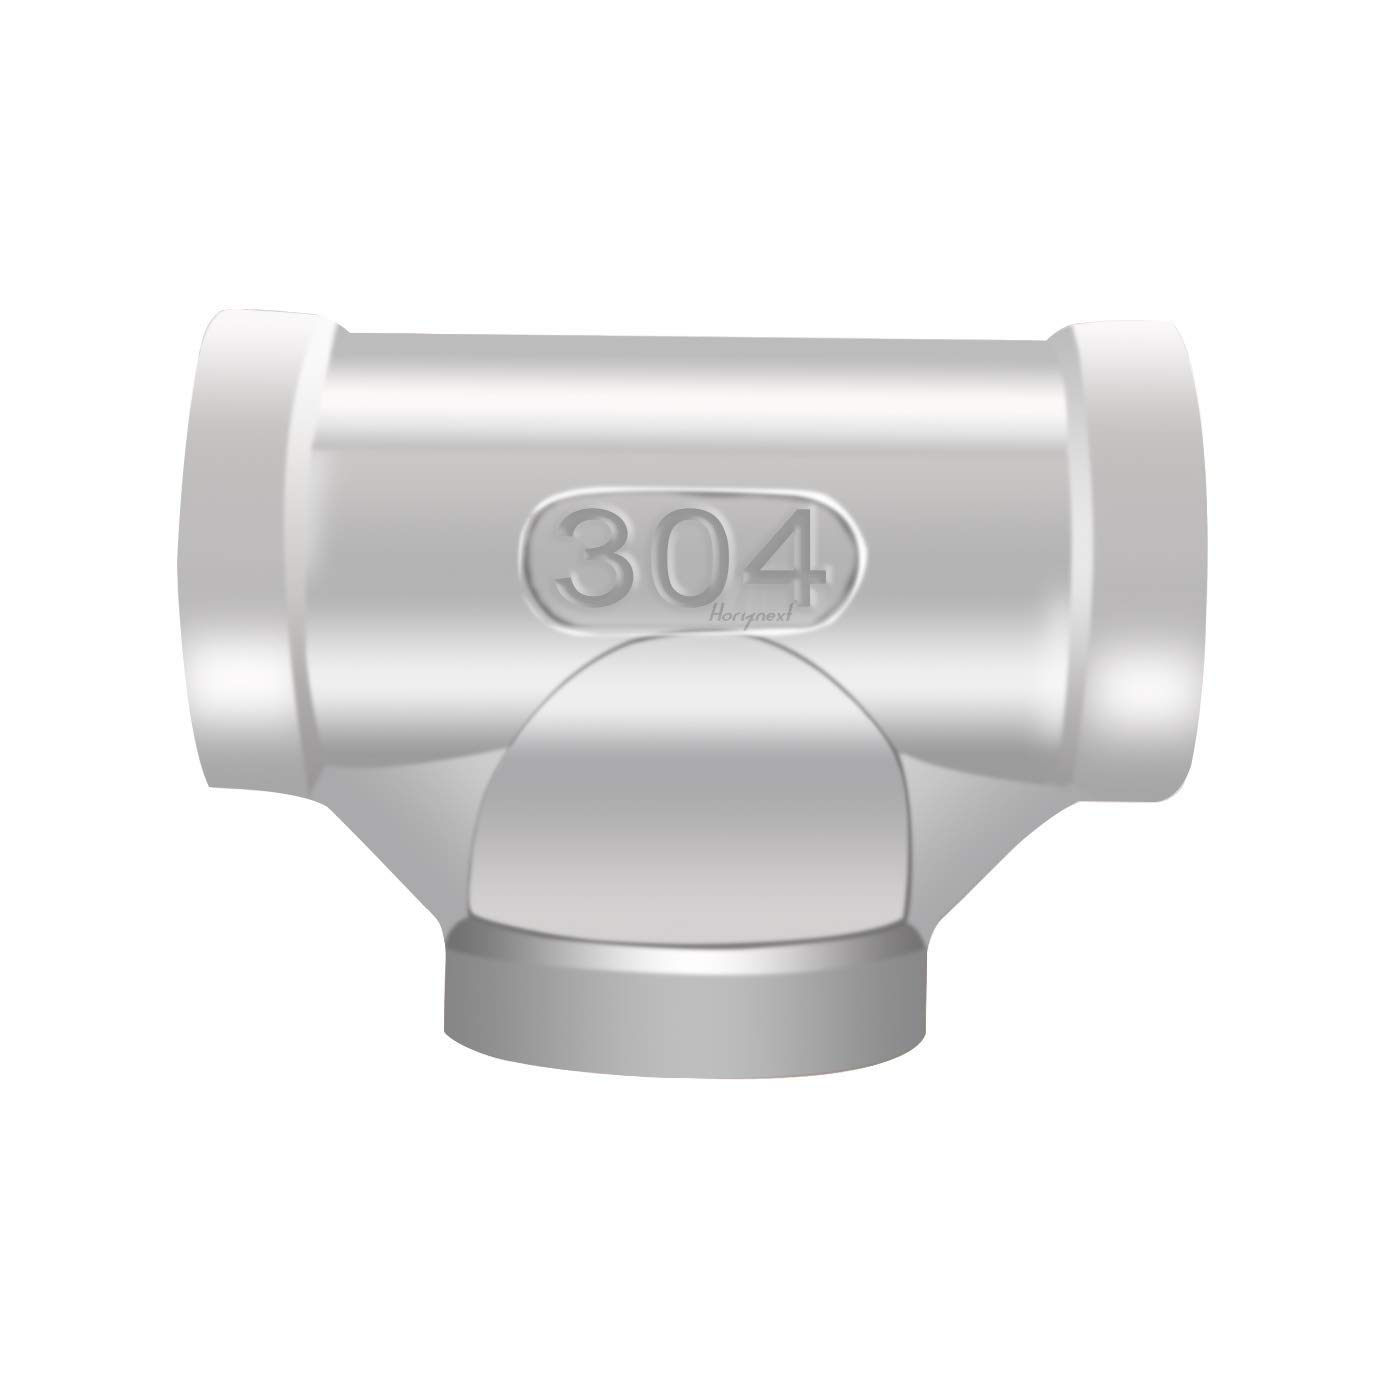 "Horiznext npt 1/2"" inch tee, Threaded Stainless Steel Pipe Fittings"